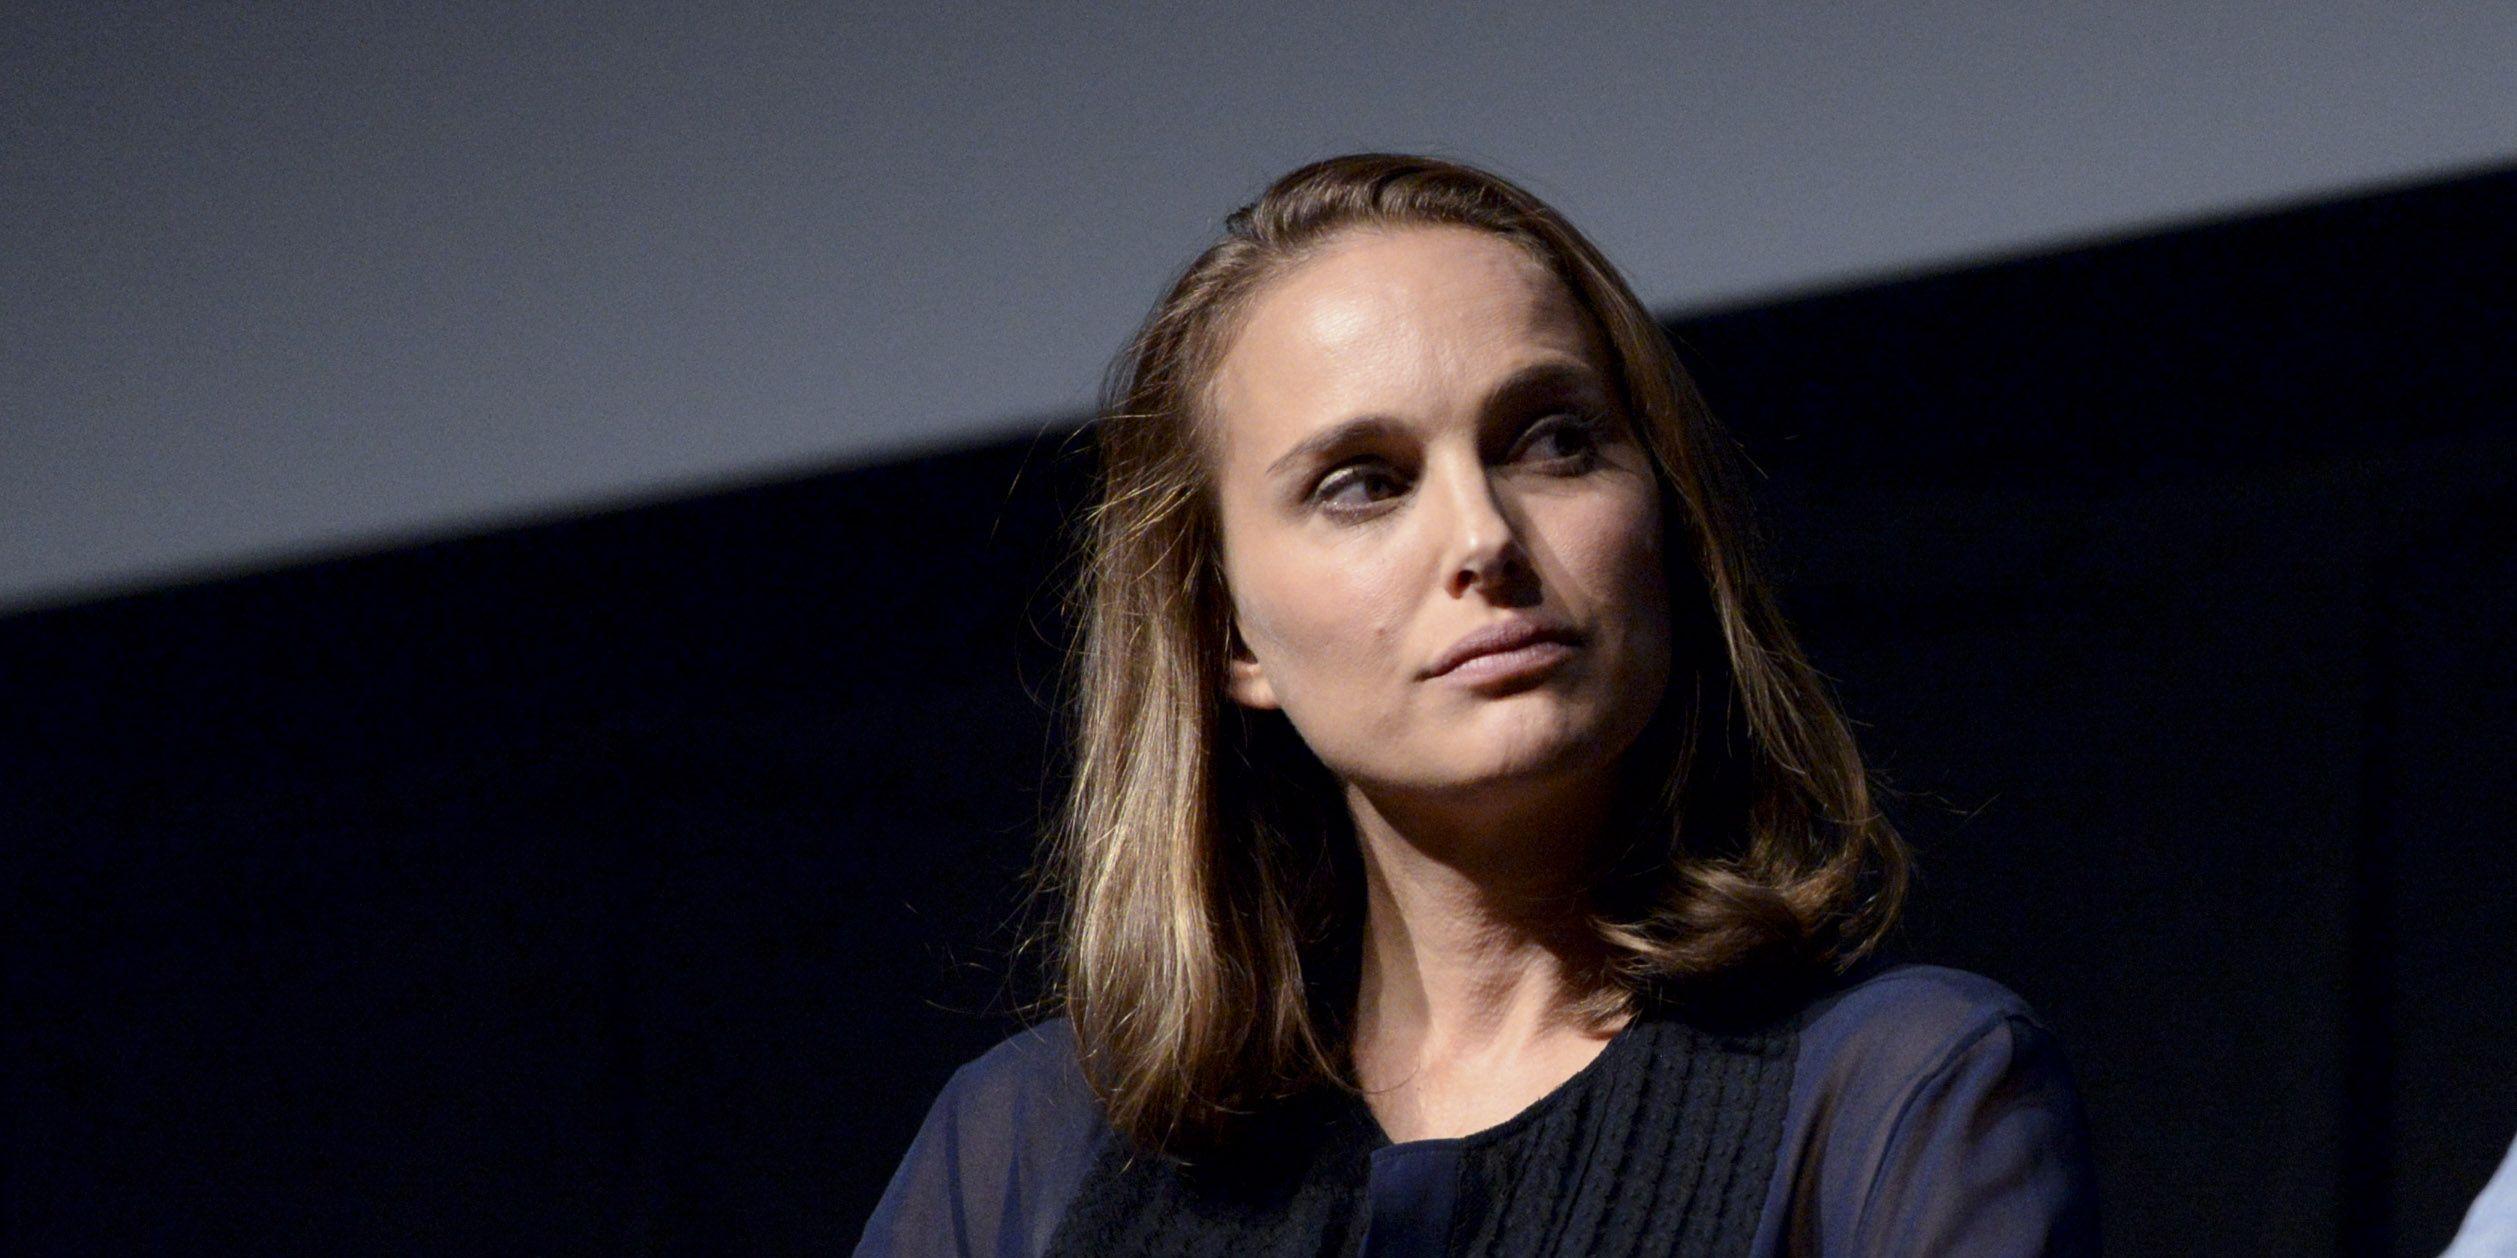 Natalie Portman attends the Telluride Film Festival 2017